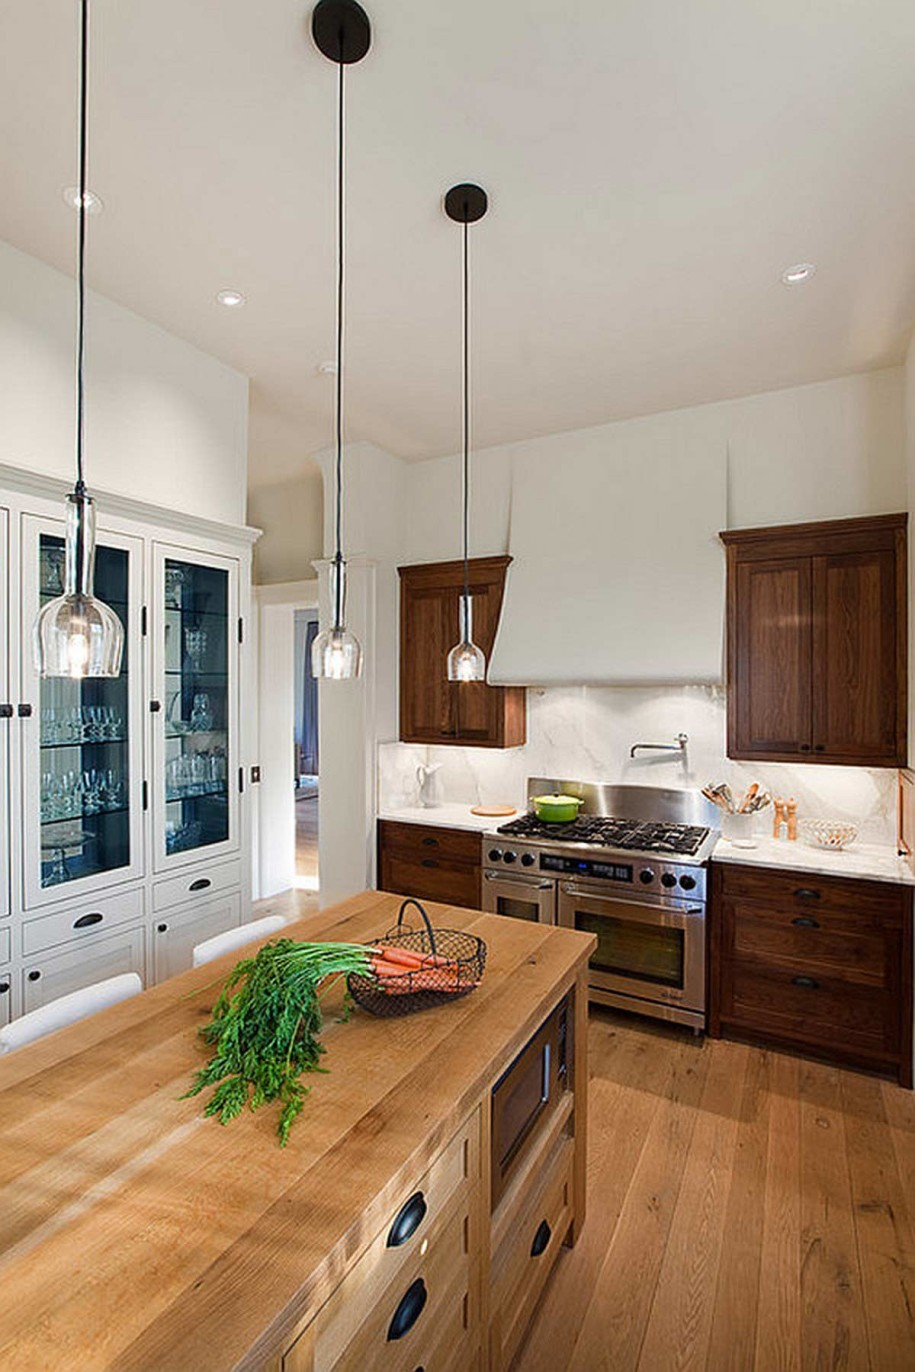 Дизайн интерьера кухни из натурального дерева от Tim Cuppett Architects